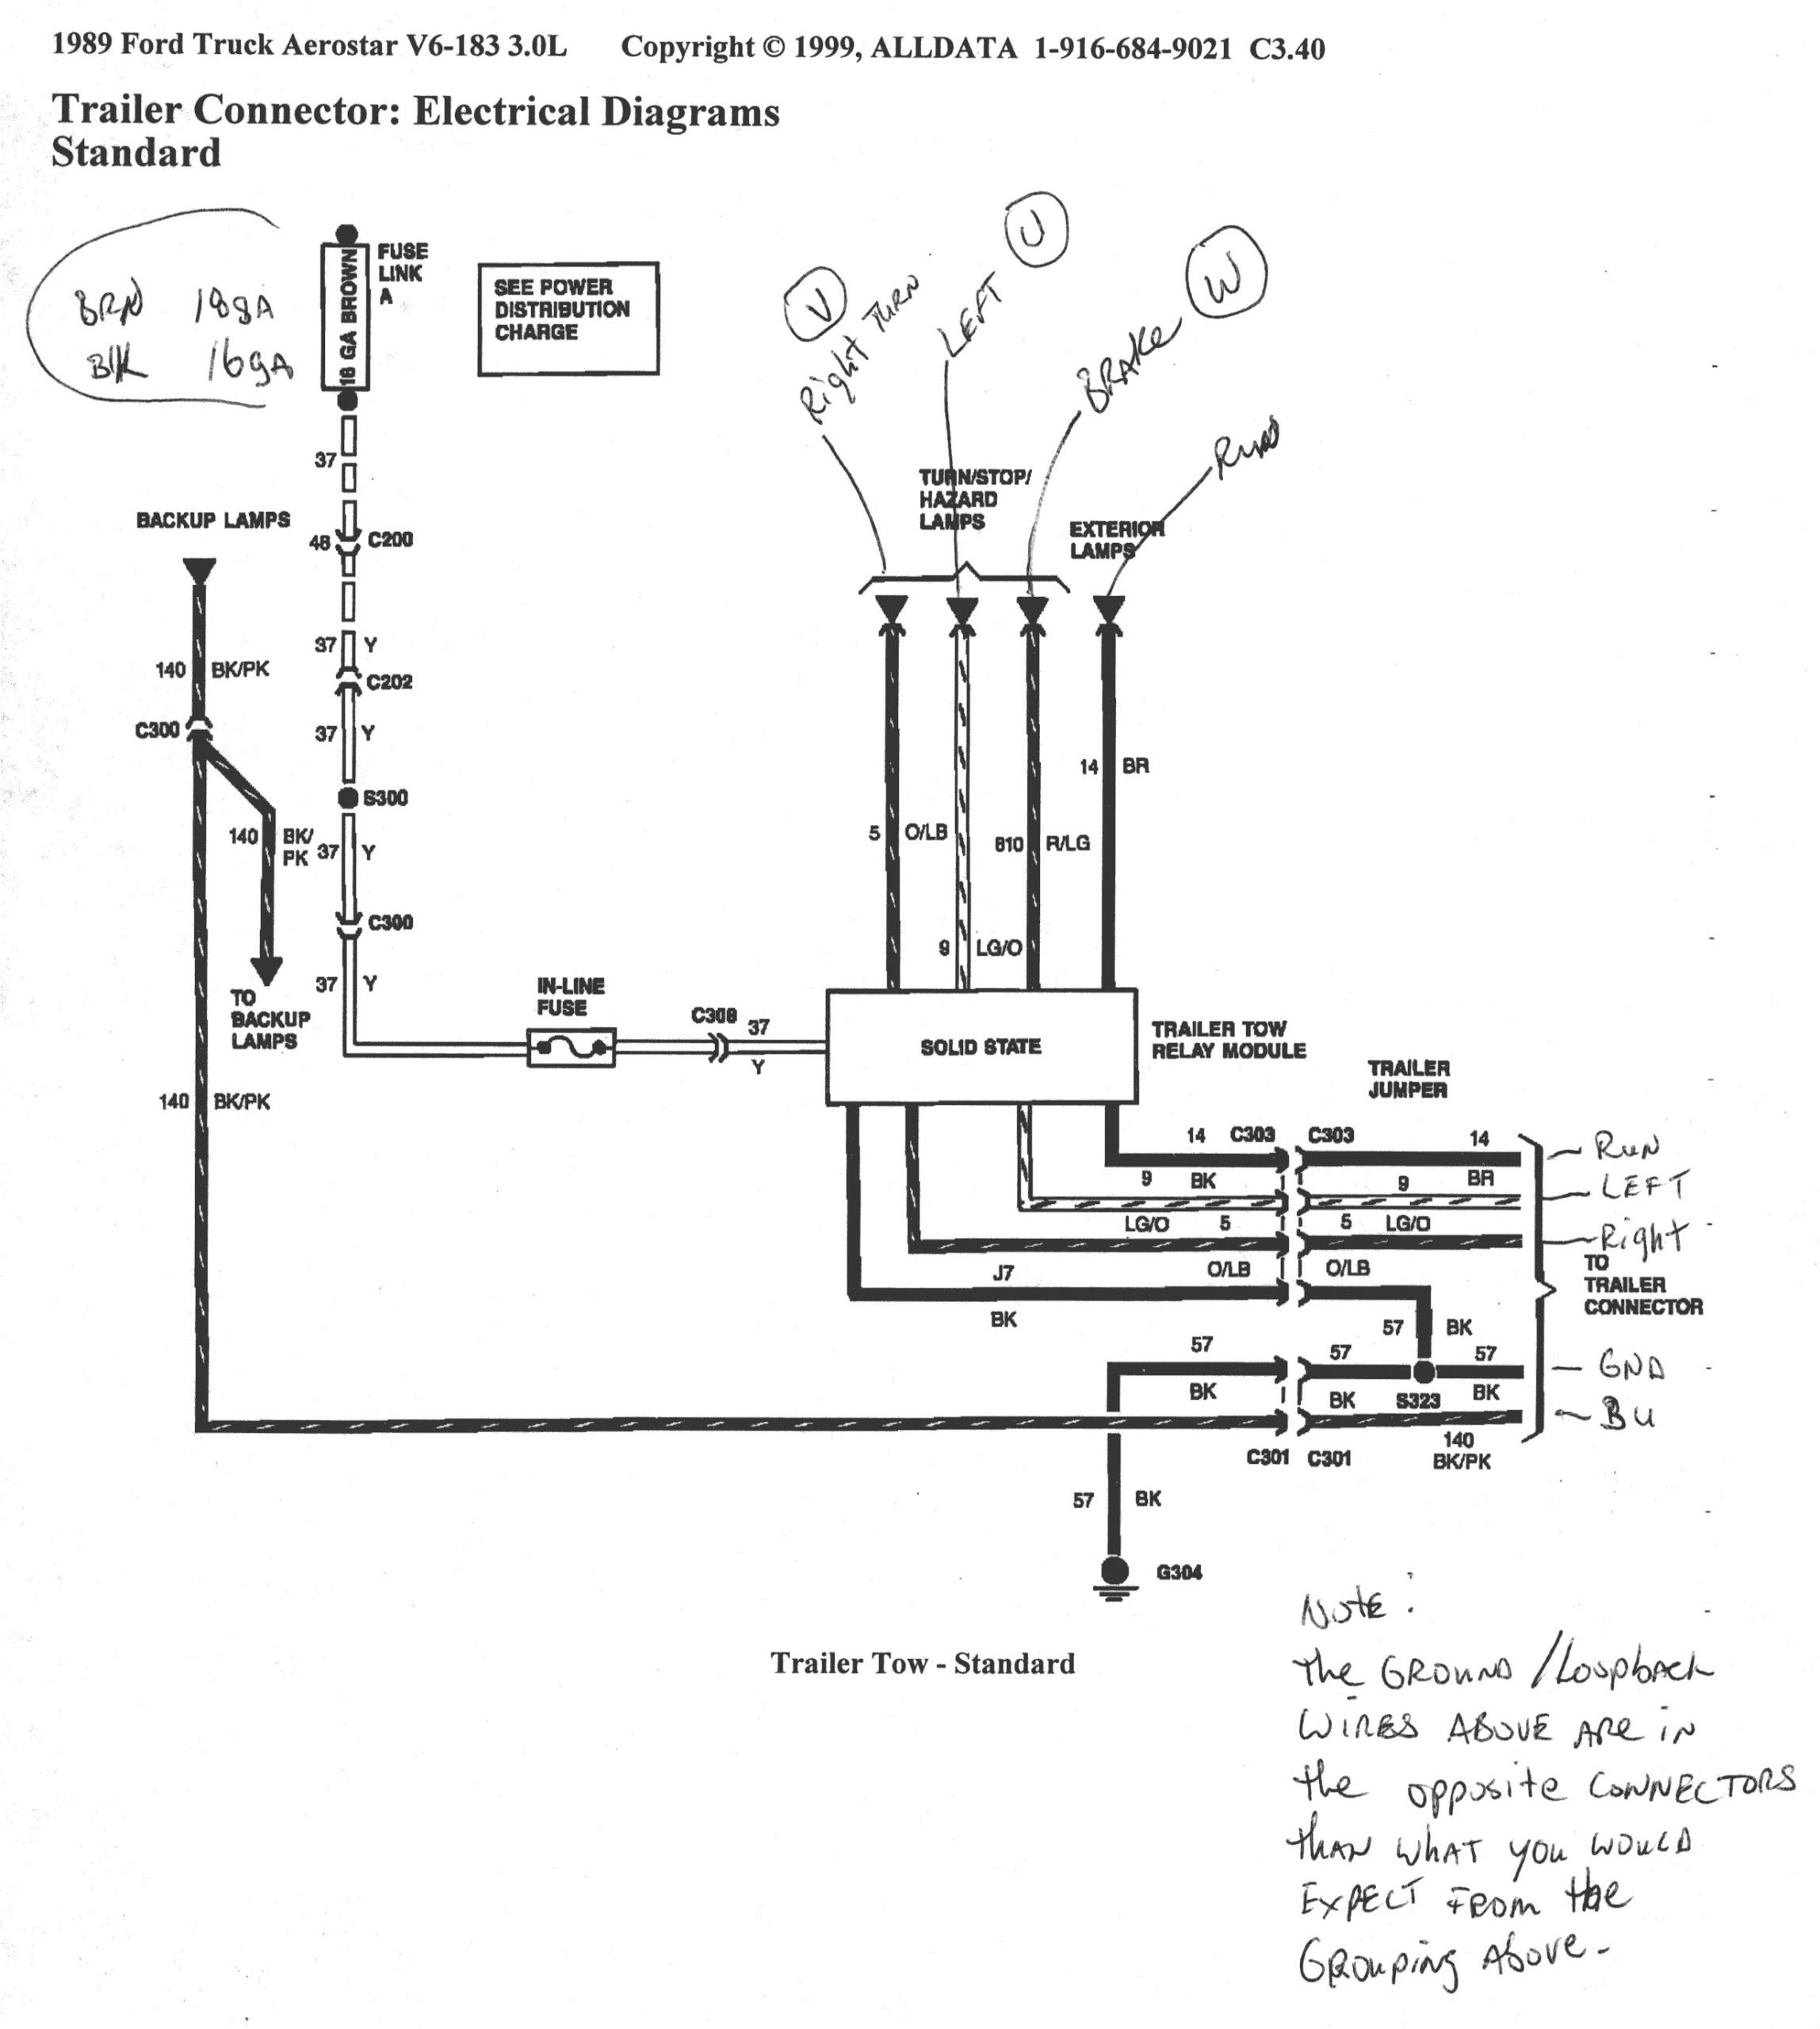 2004 ford explorer wiring harness diagram ford f150 trailer wiring harness diagram awesome f350 westmagazine rh natebird me 2004 ford f 250 15p jpg